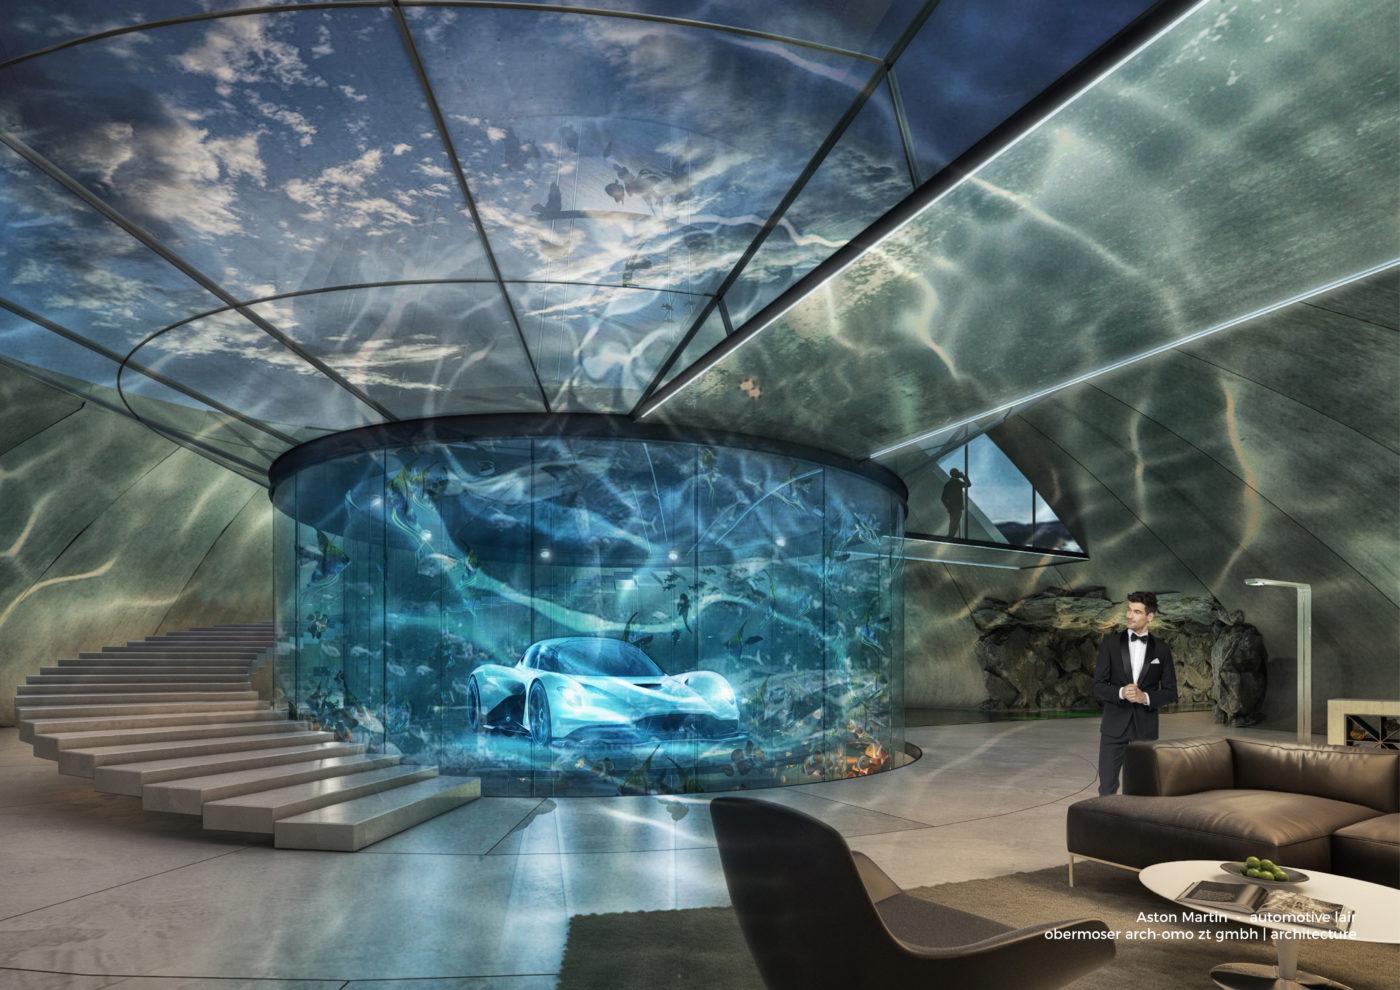 Work With Aston Martin To Custom Design Your Garage